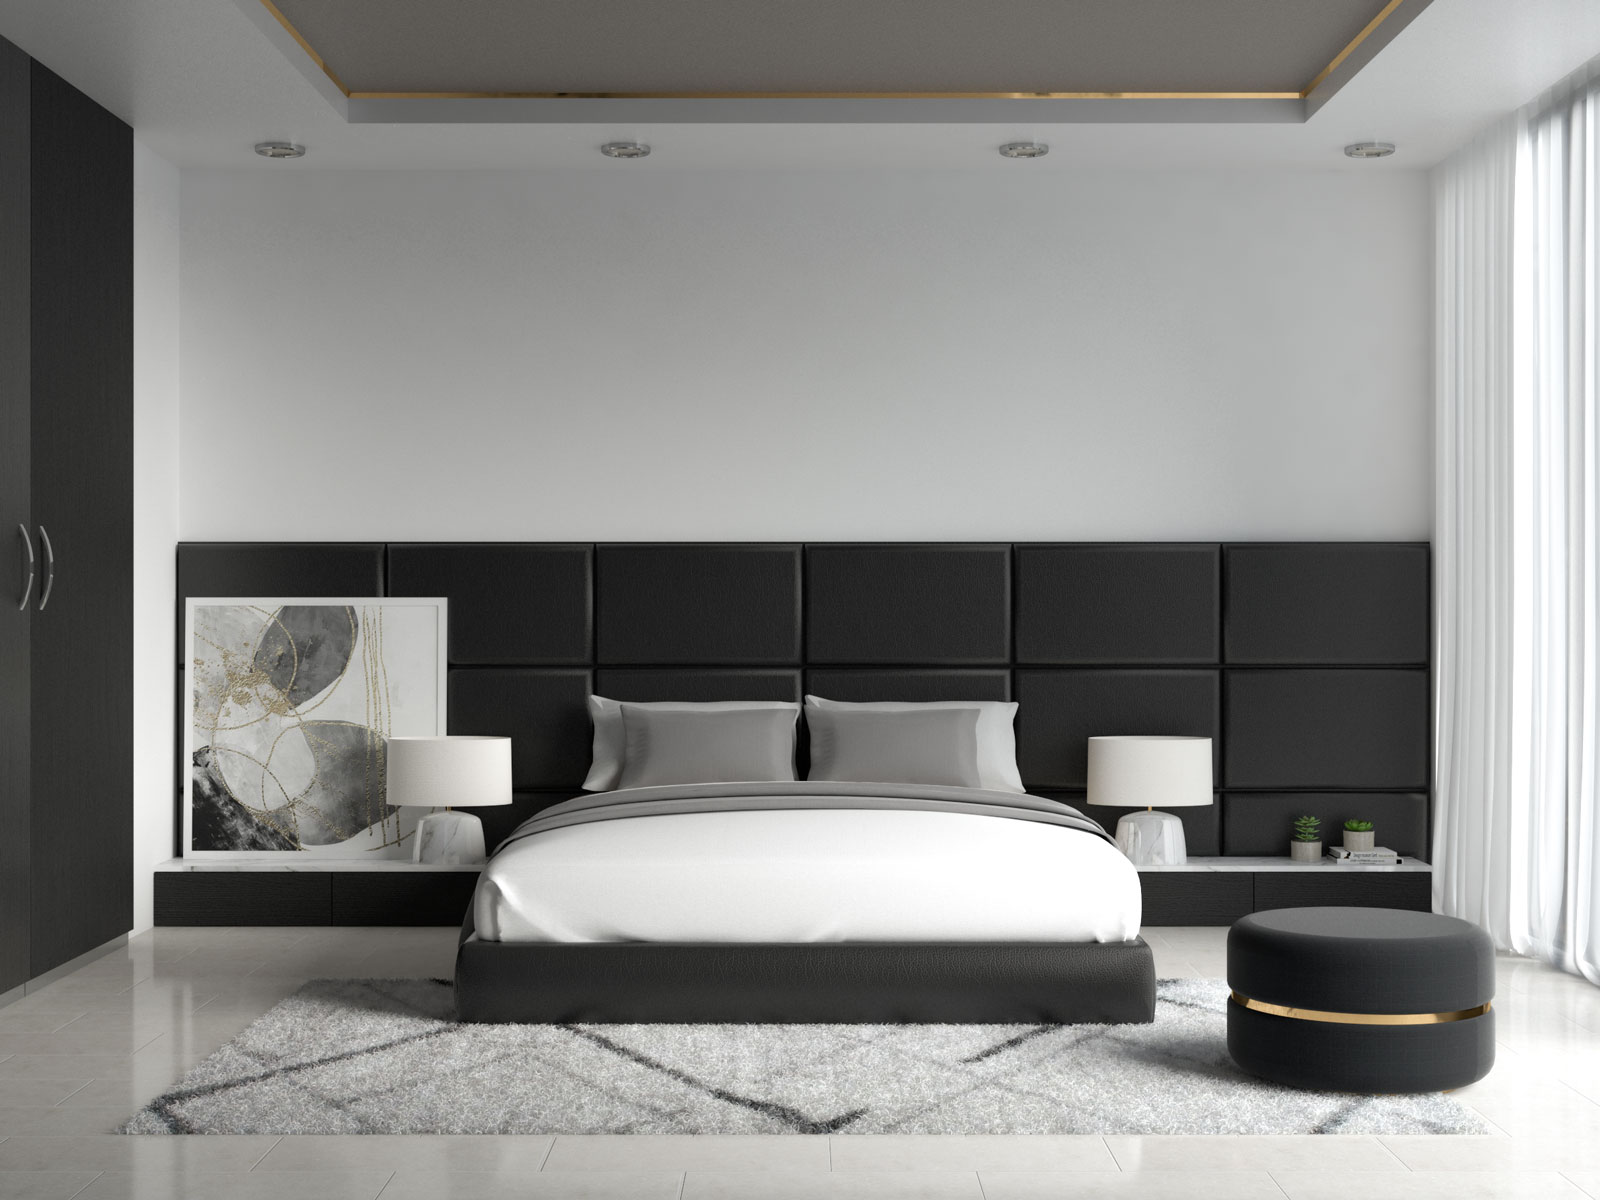 White and gray bedding inside black bedroom